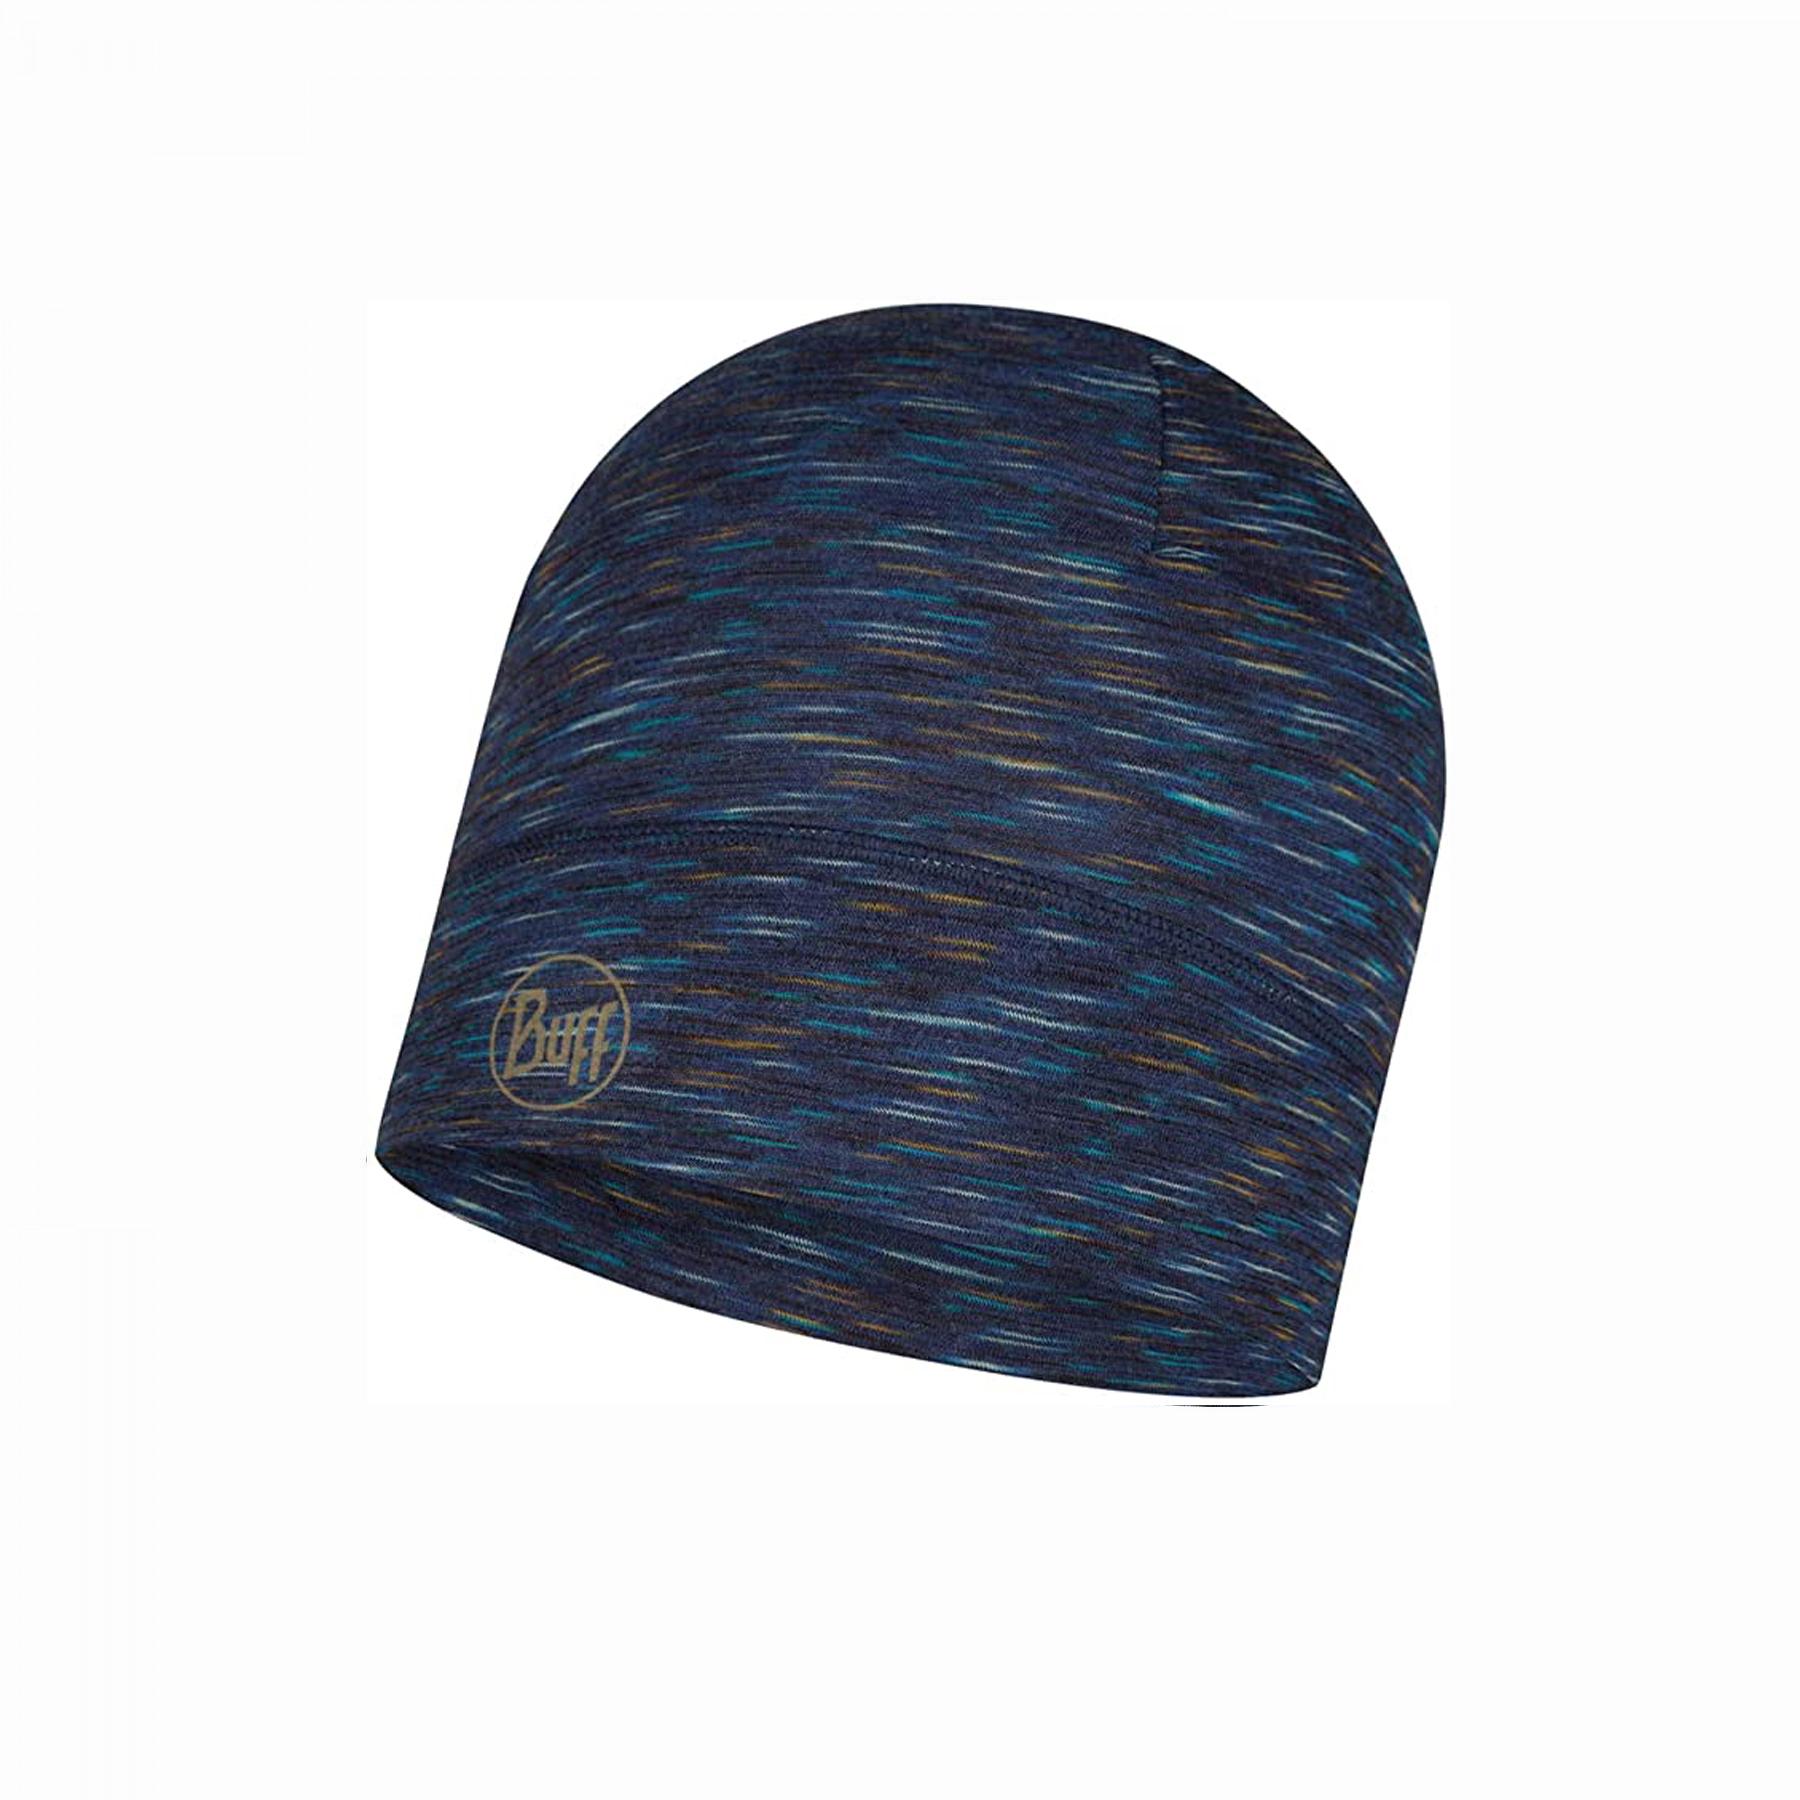 Gorro nieve BUFF Lightweight Merino Wool Hat Denim Multistripes